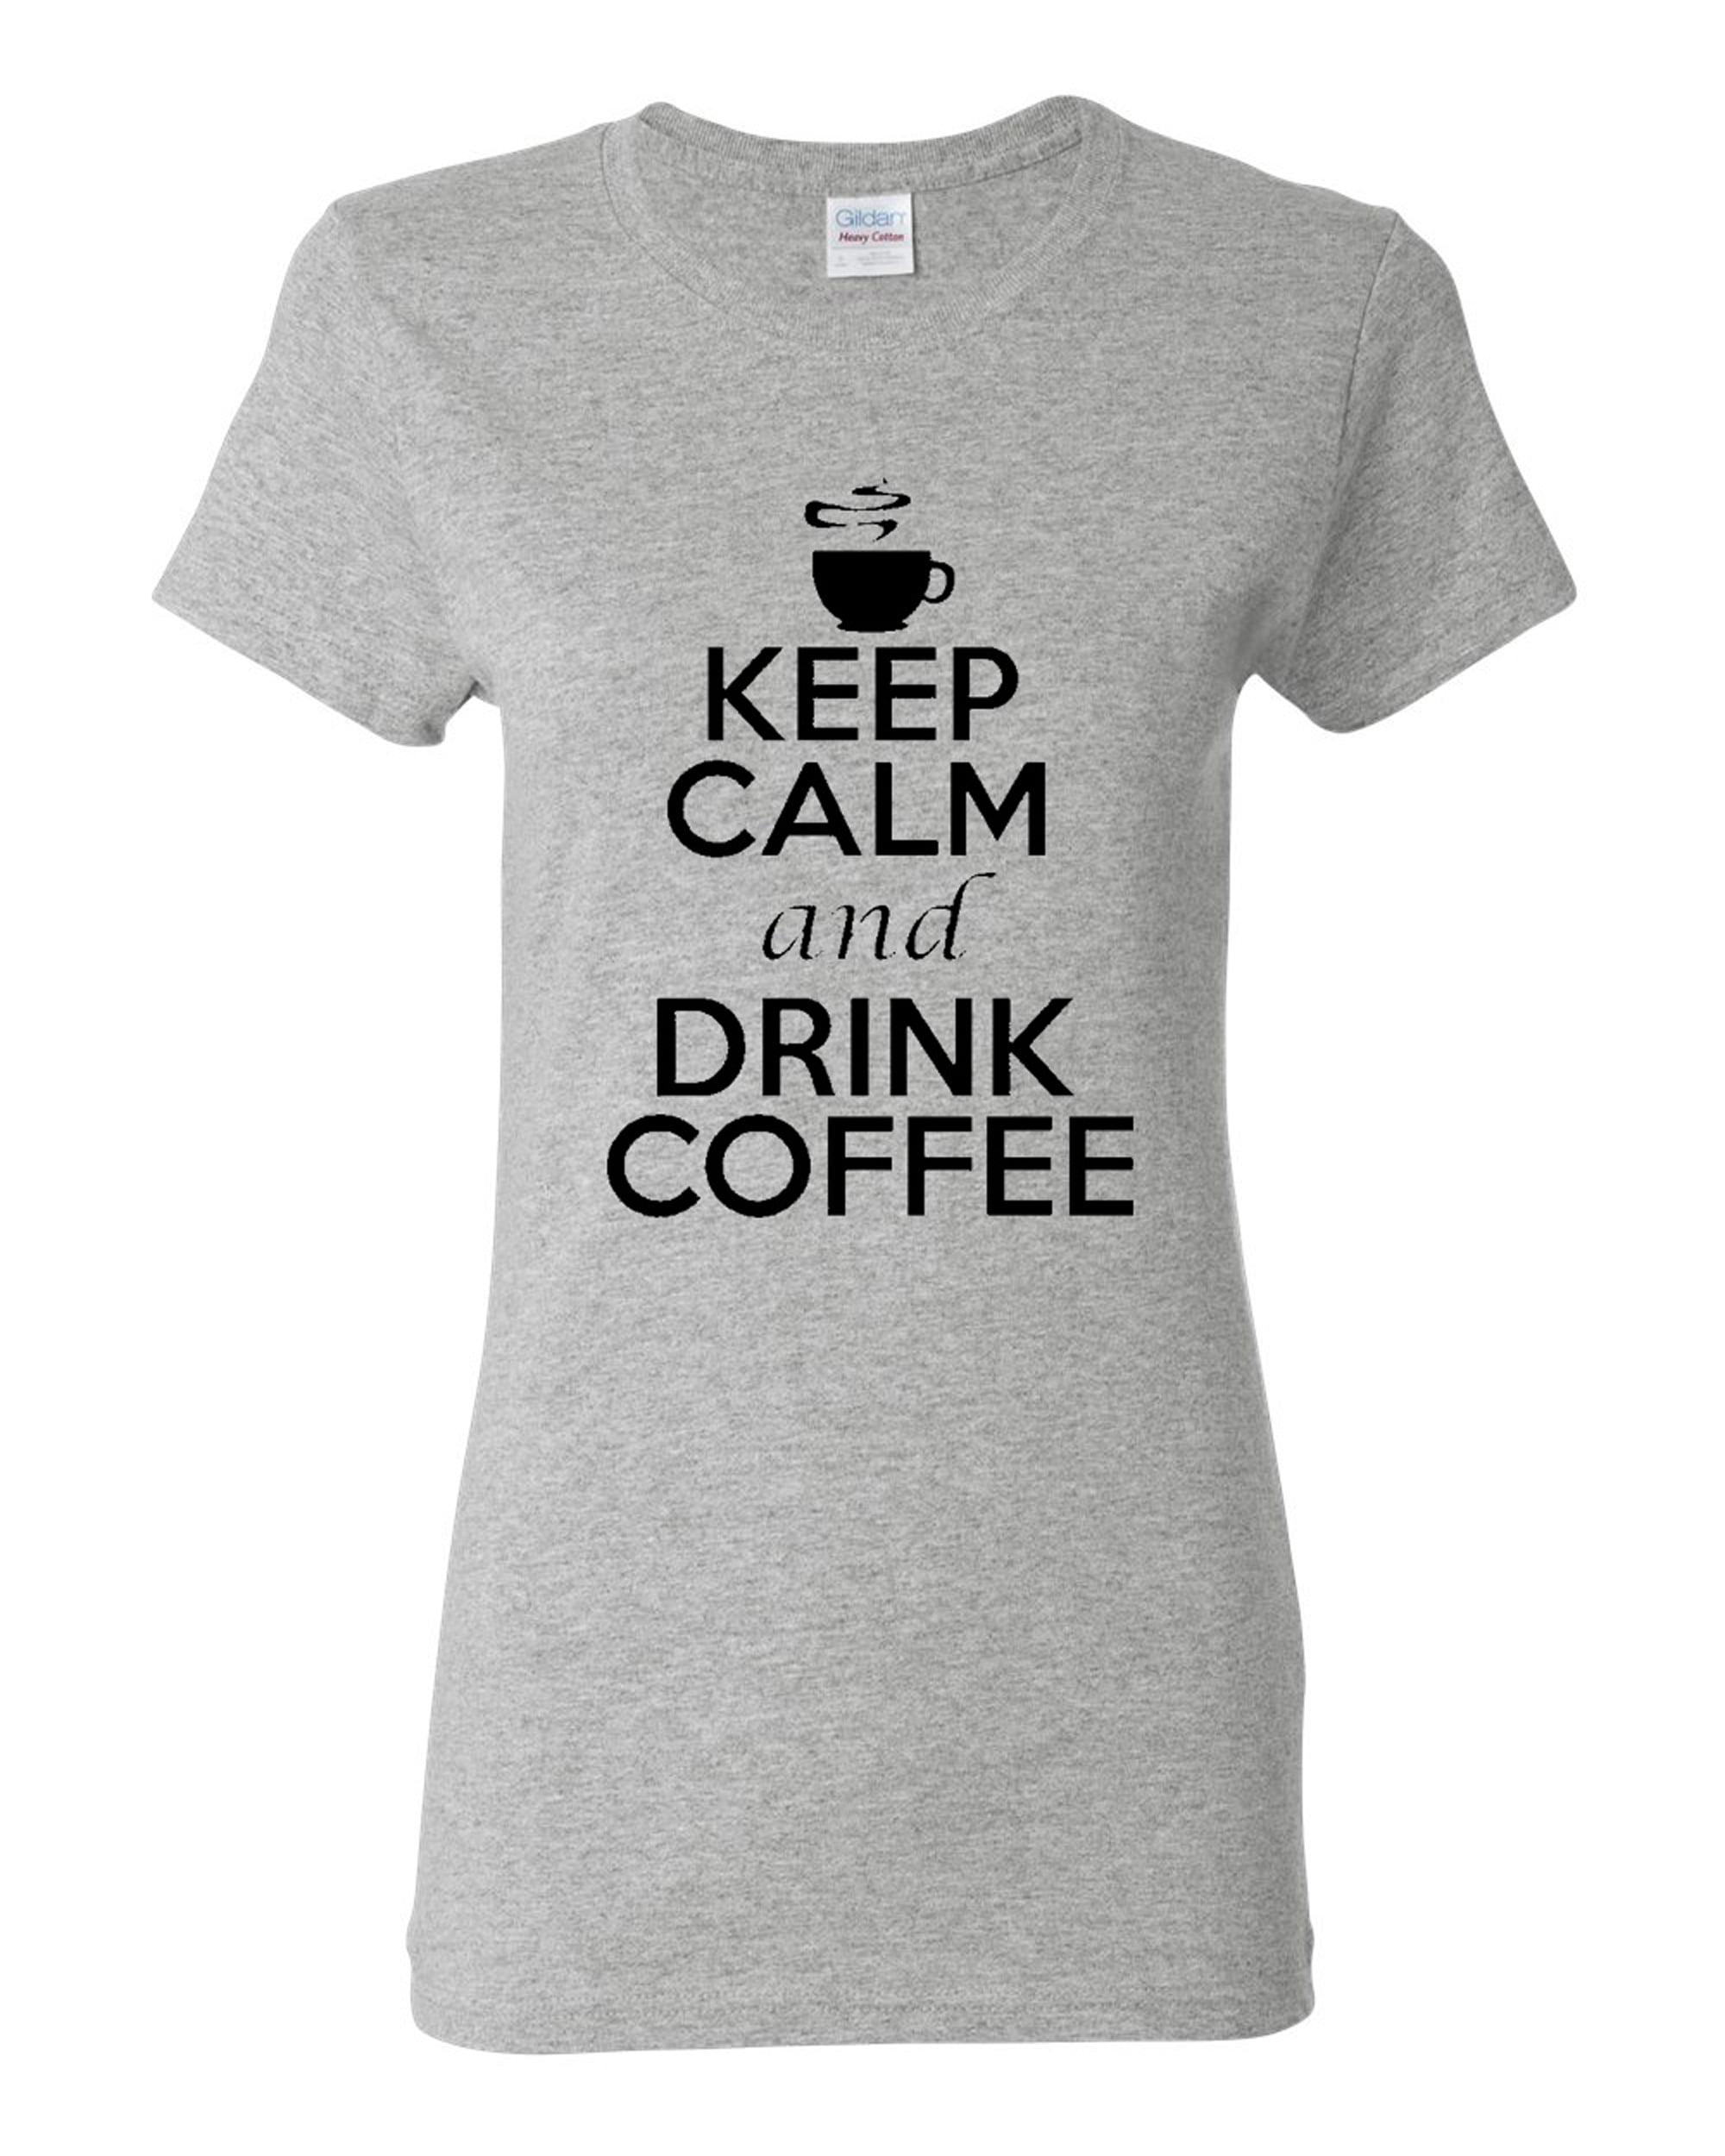 Ladies Keep Calm And Drink Coffee T-Shirt Tee